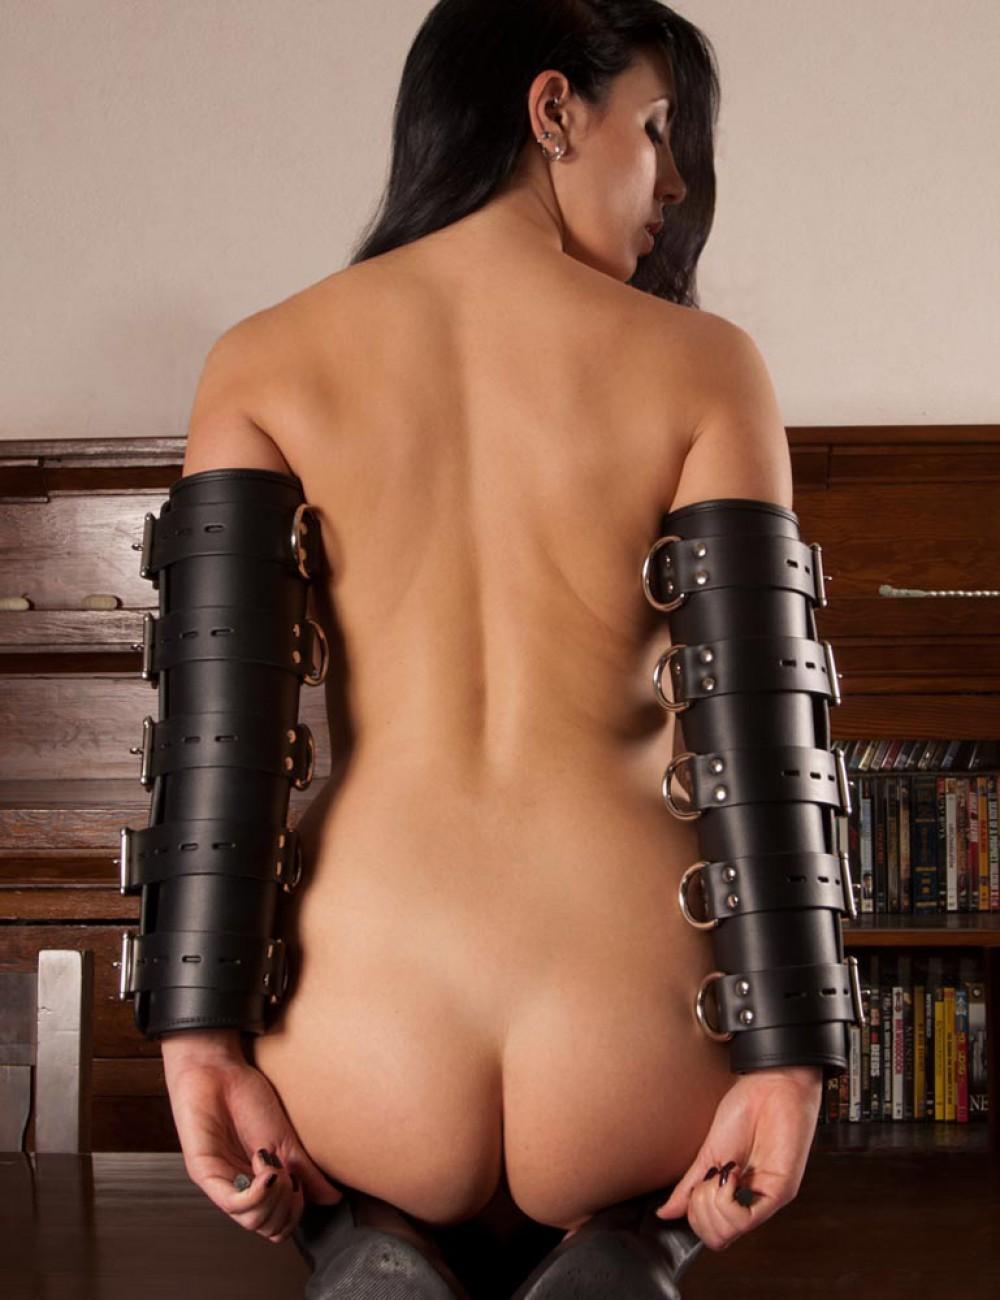 Premium Leather Arm Splints with Locking Buckles